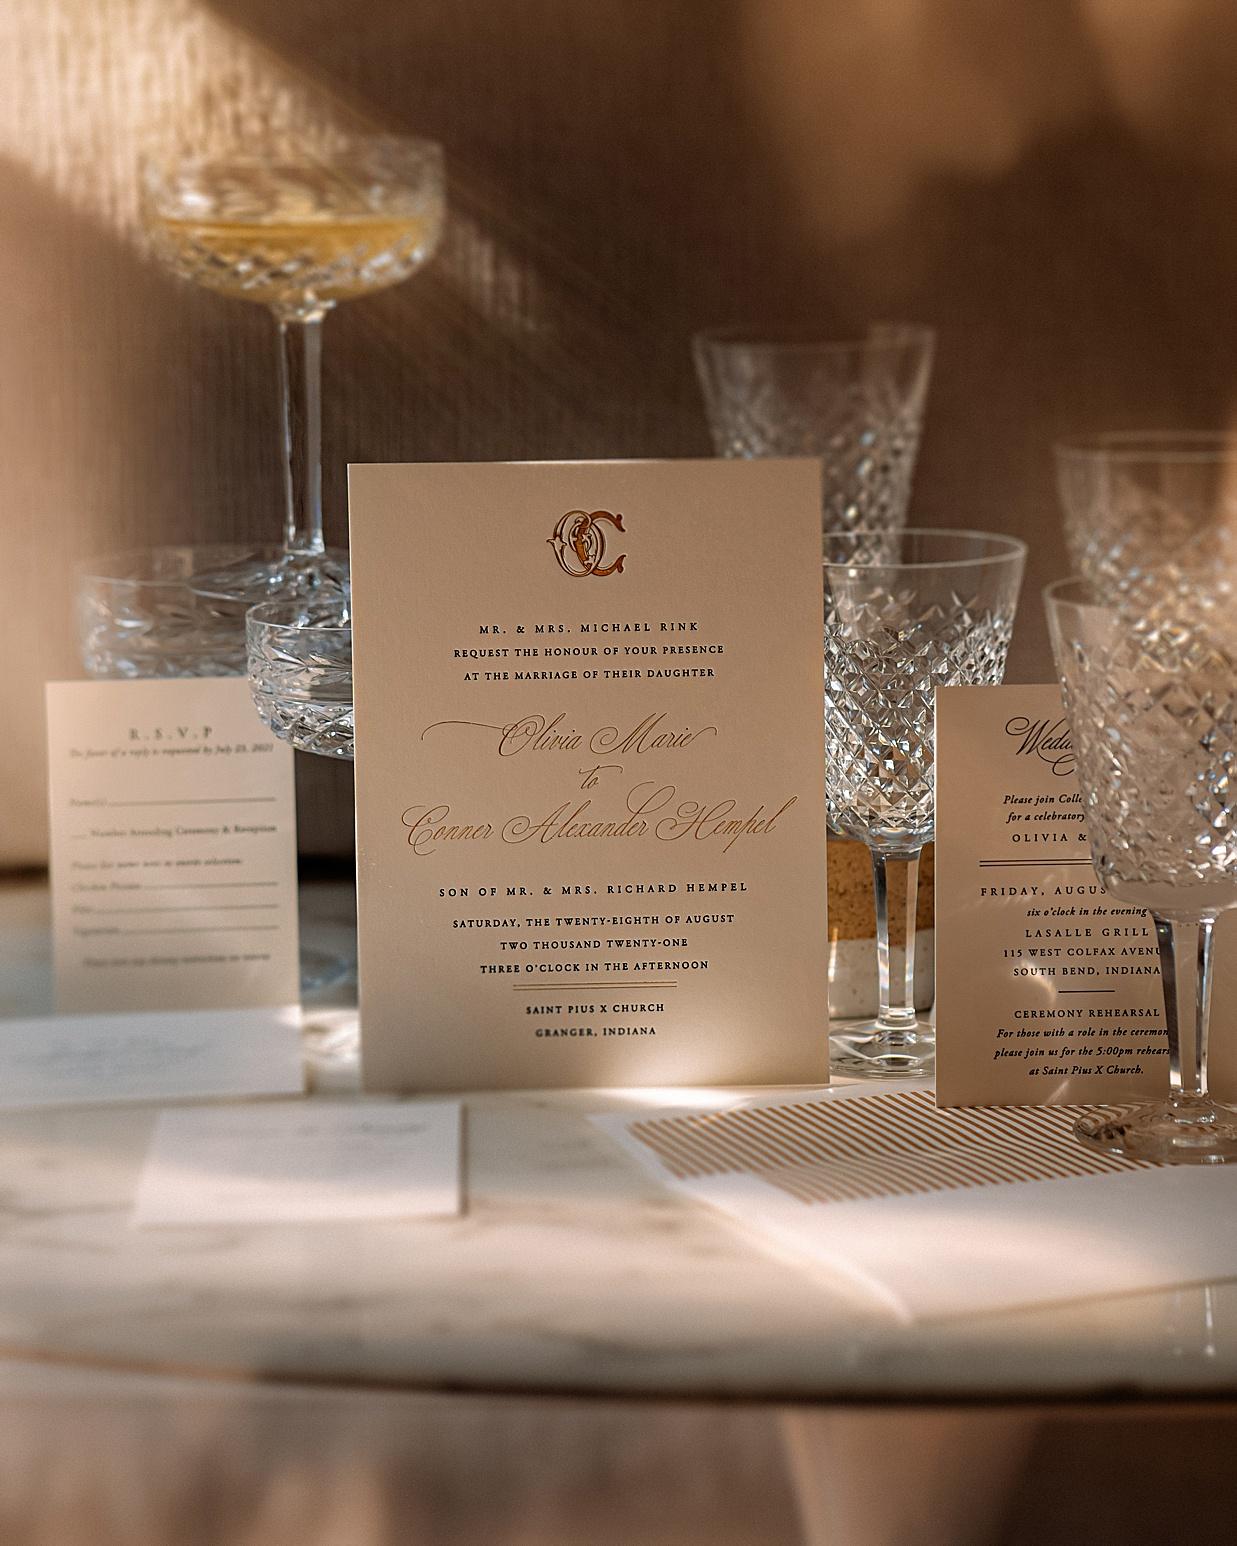 olivia rink wedding, olivia rink wedding invitations, wedding invitations, classic wedding invitations